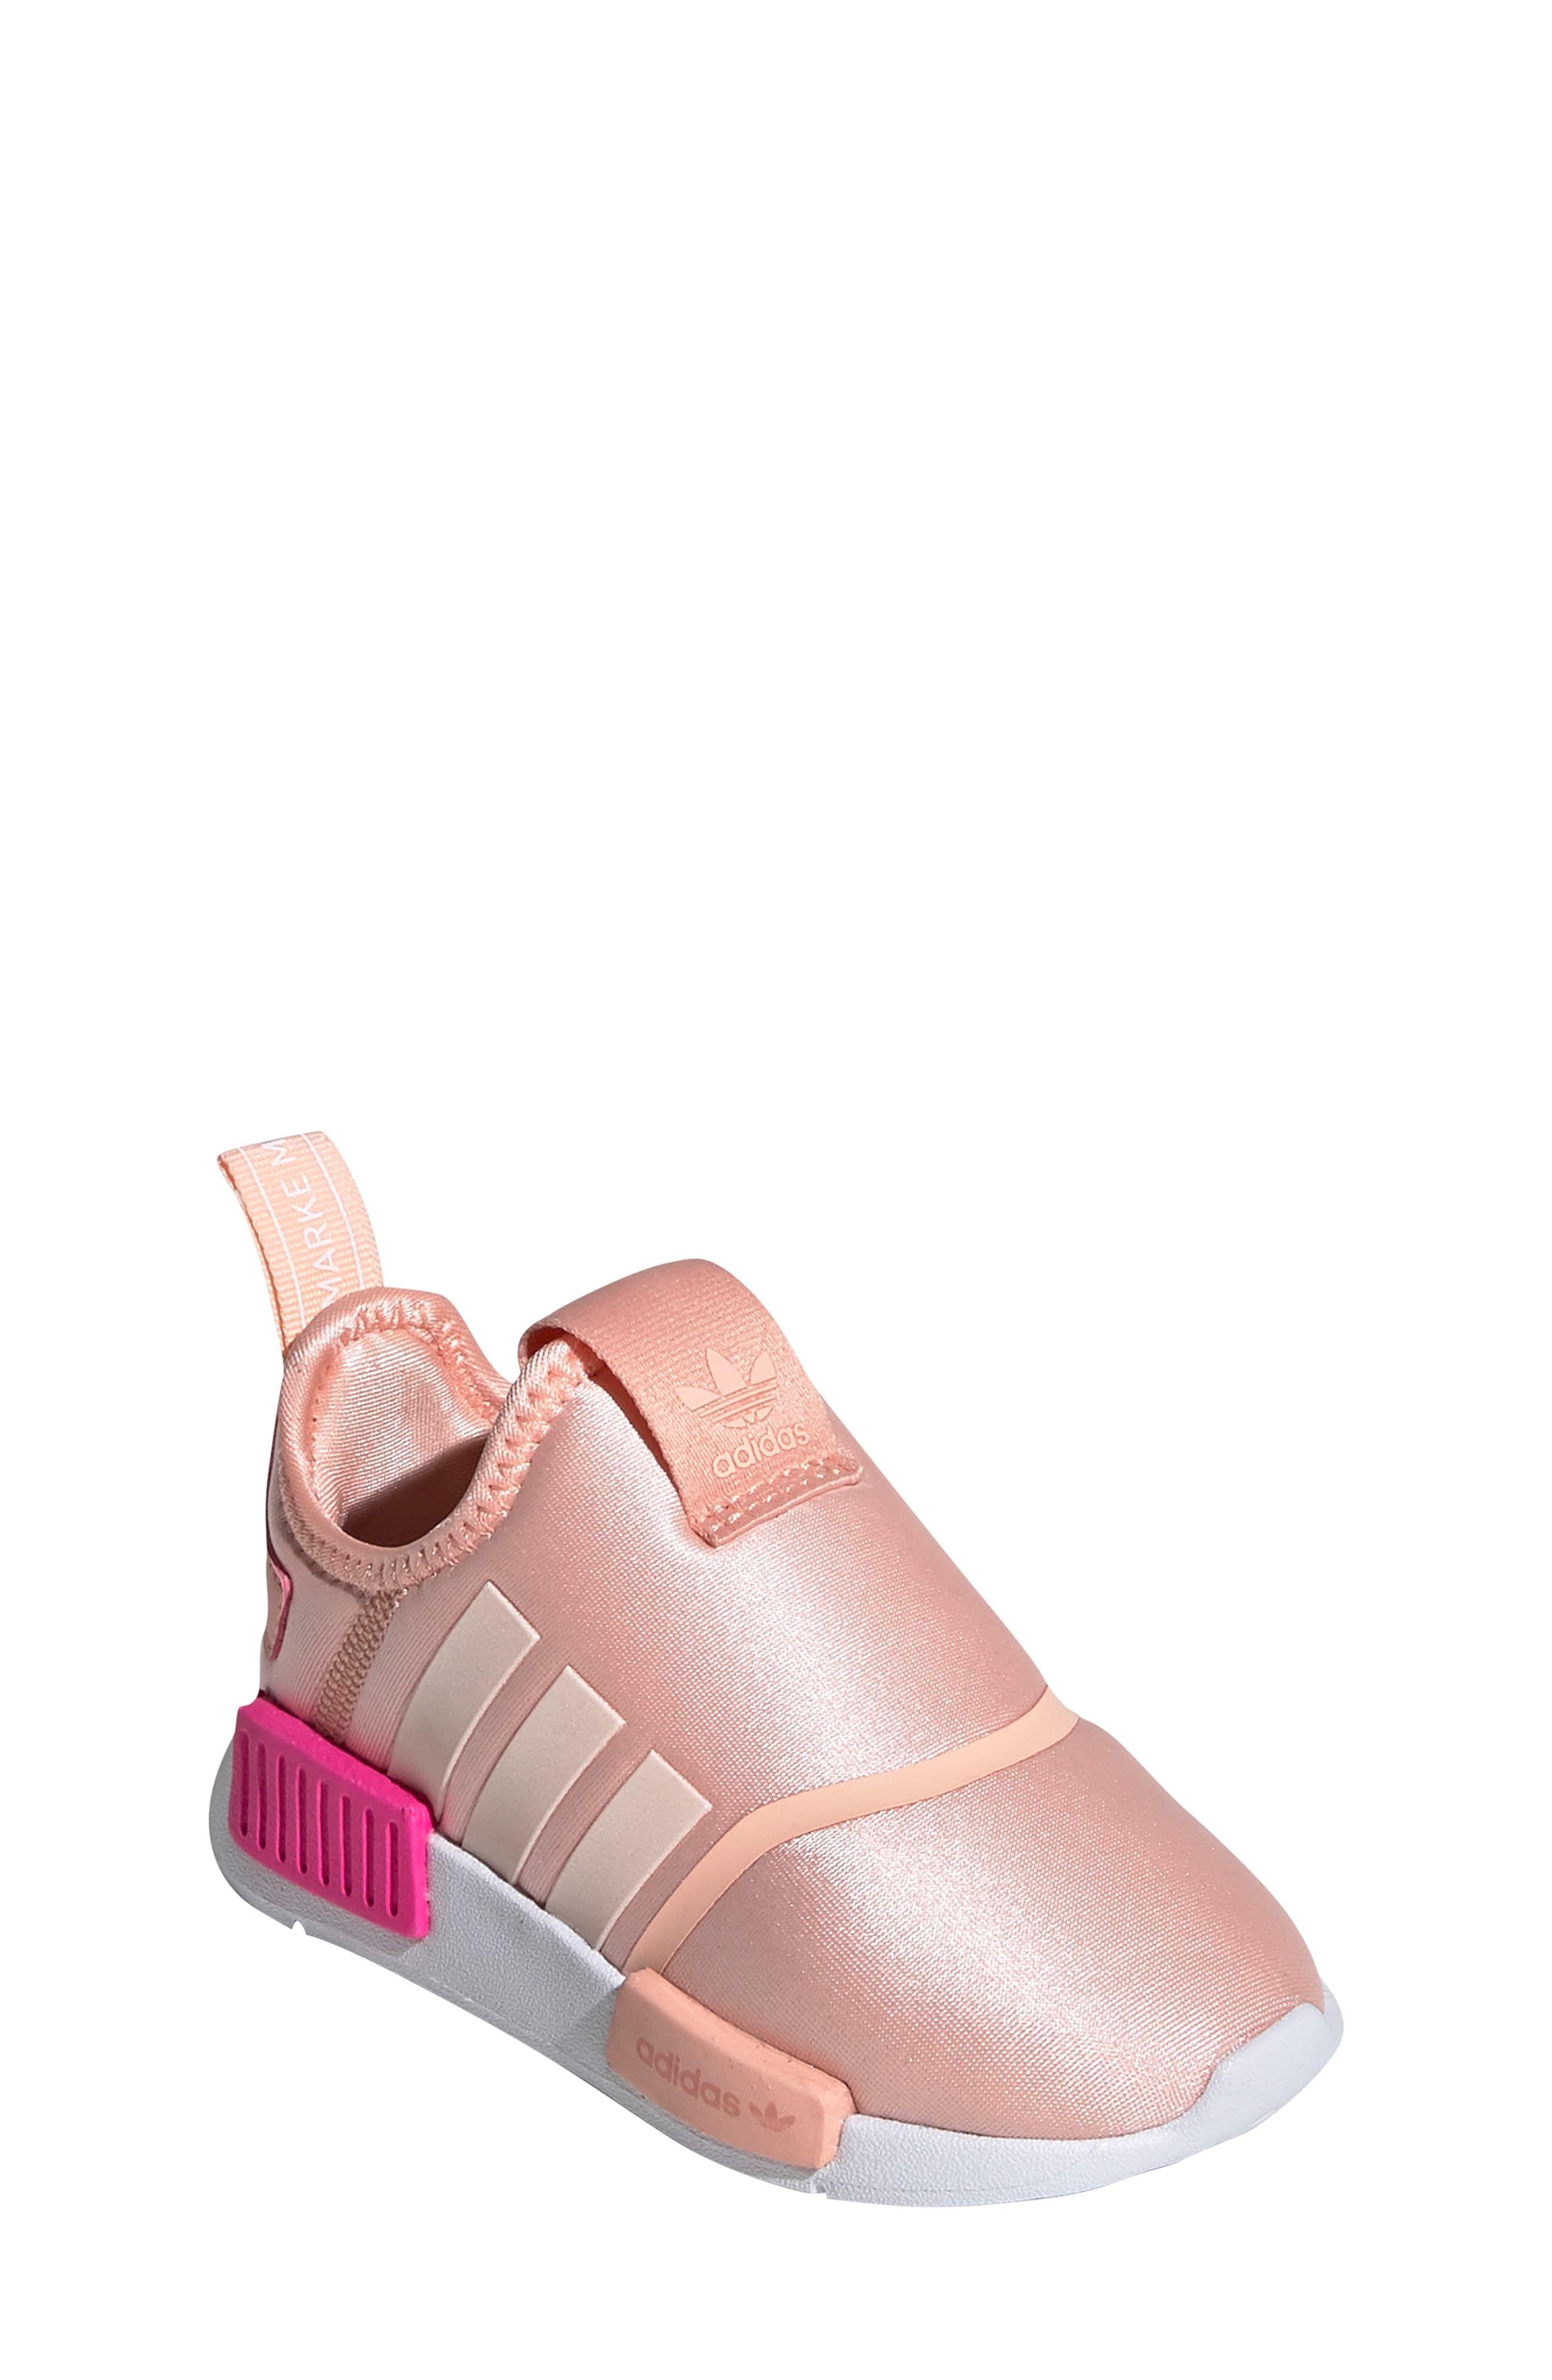 adidas Childrens NMD 360 Glow Pink & White | adidas NMD Kids